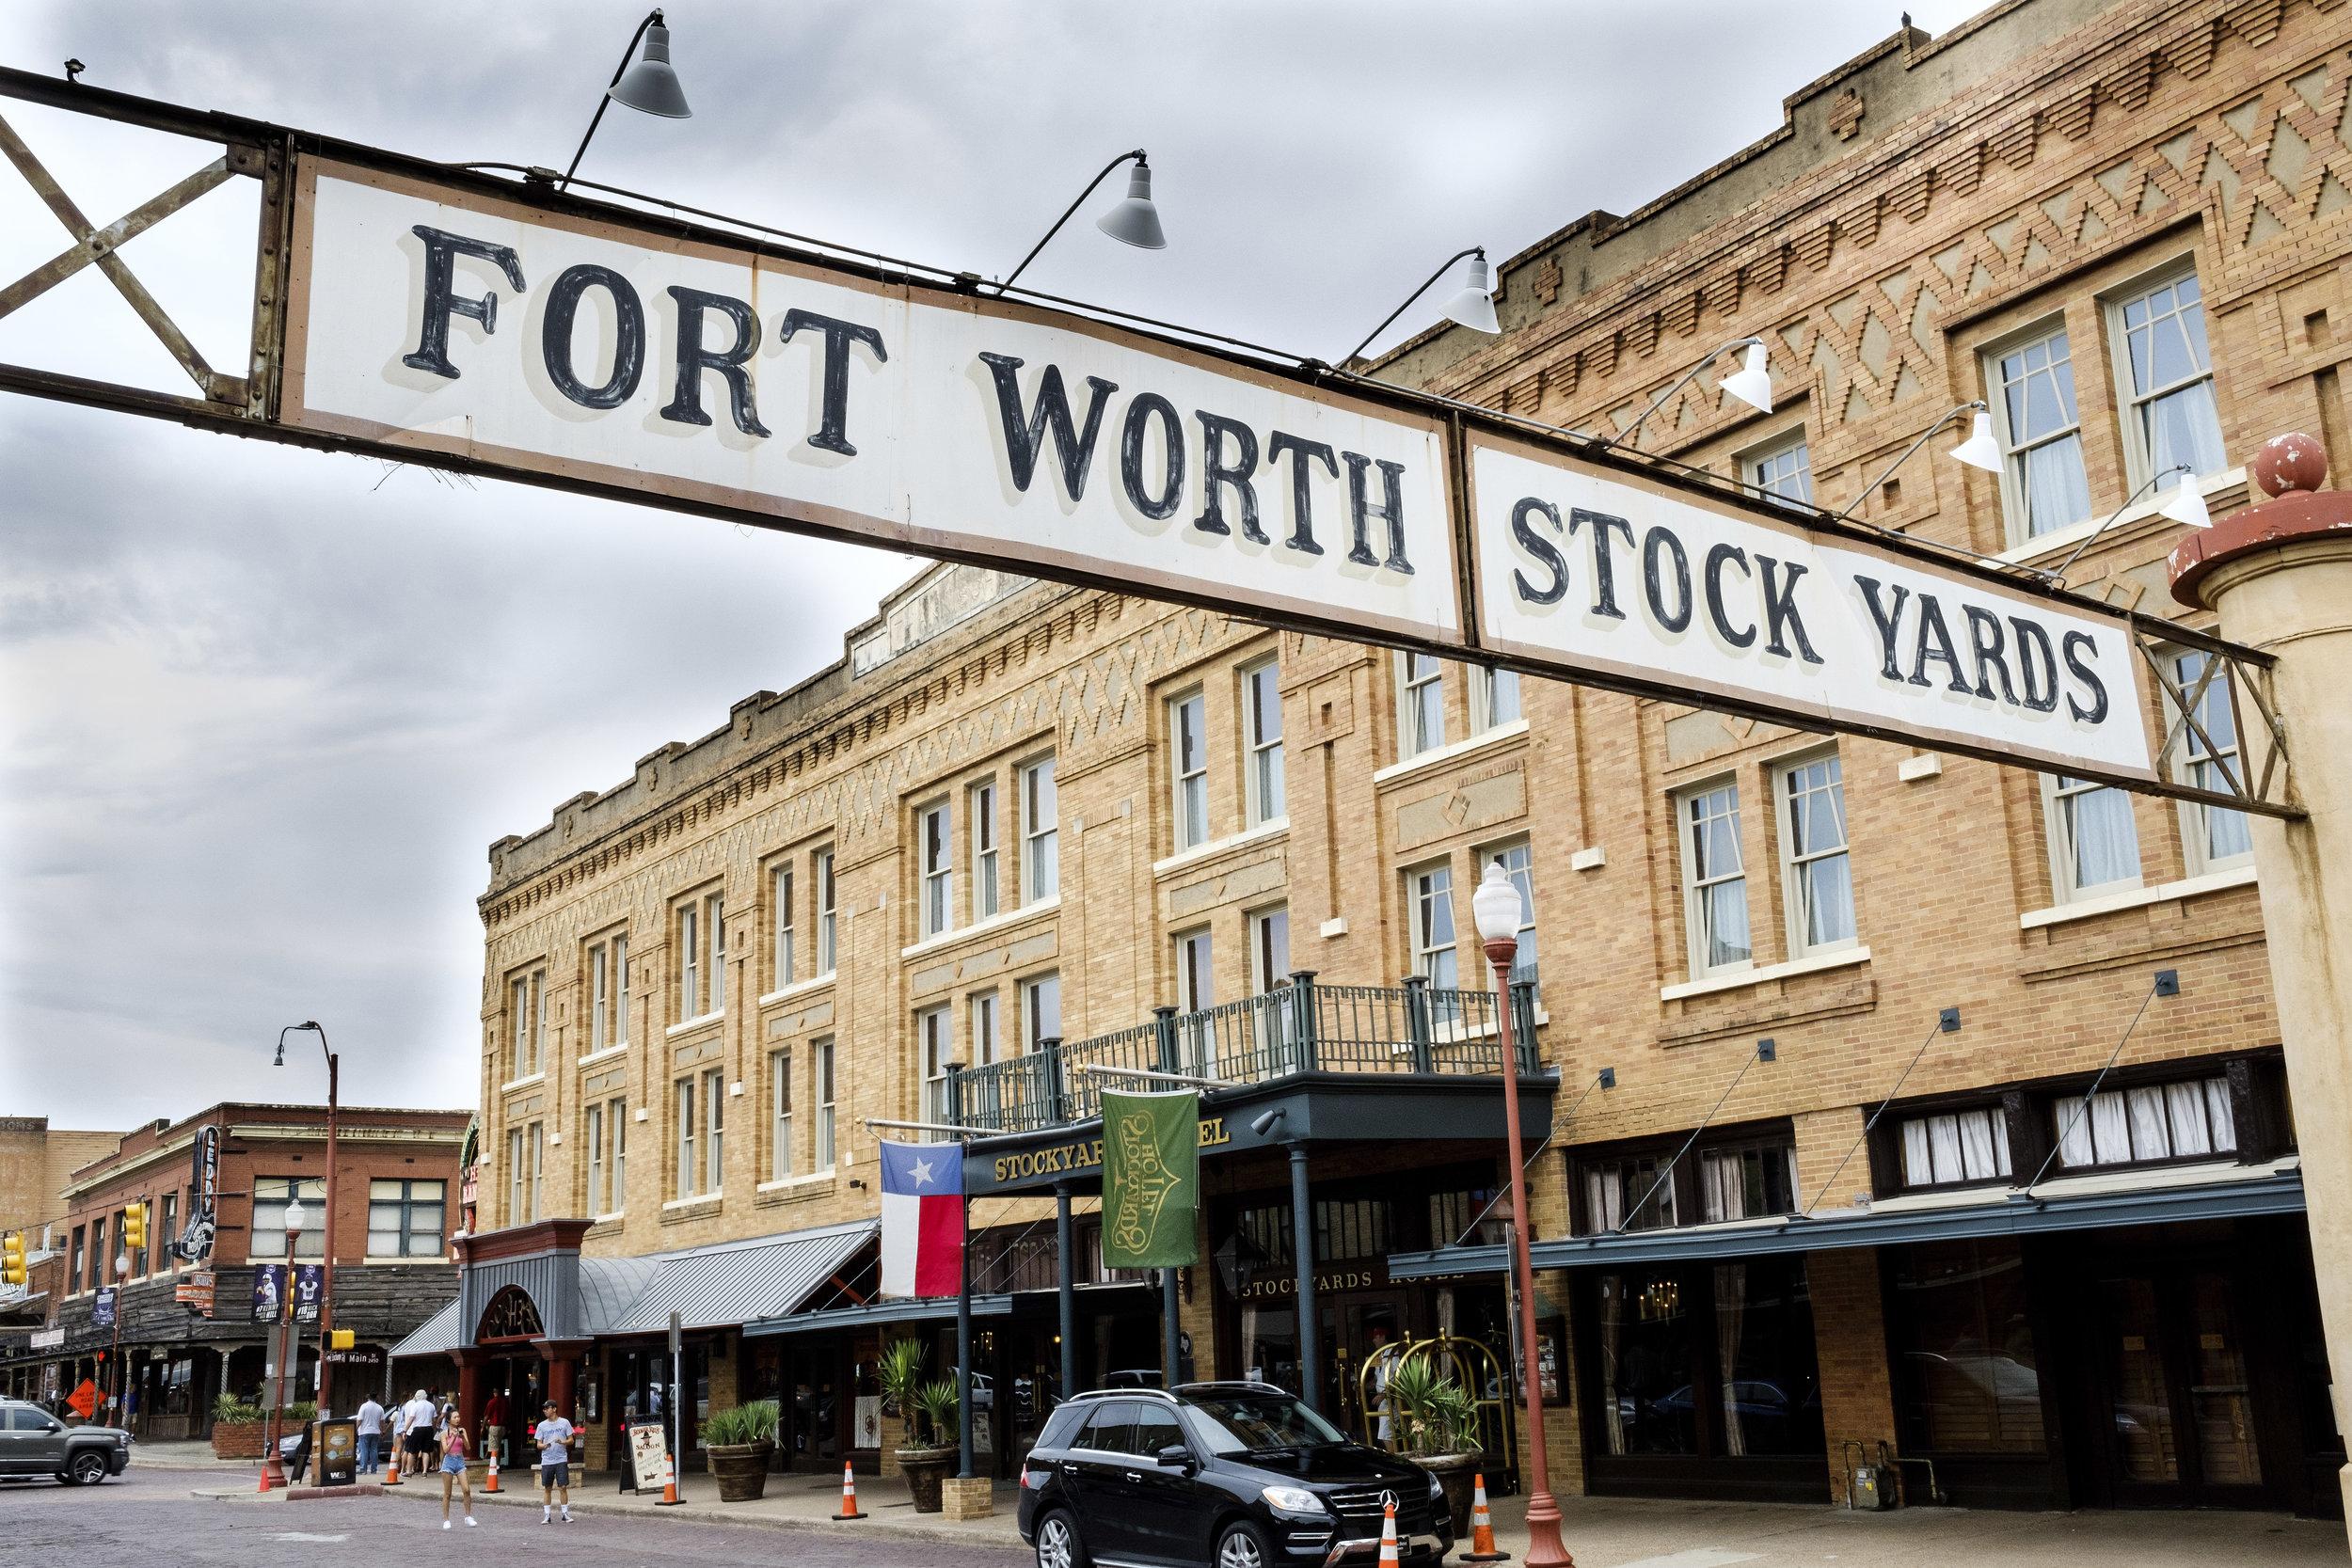 Fort Worth Stockyards Aug 2017